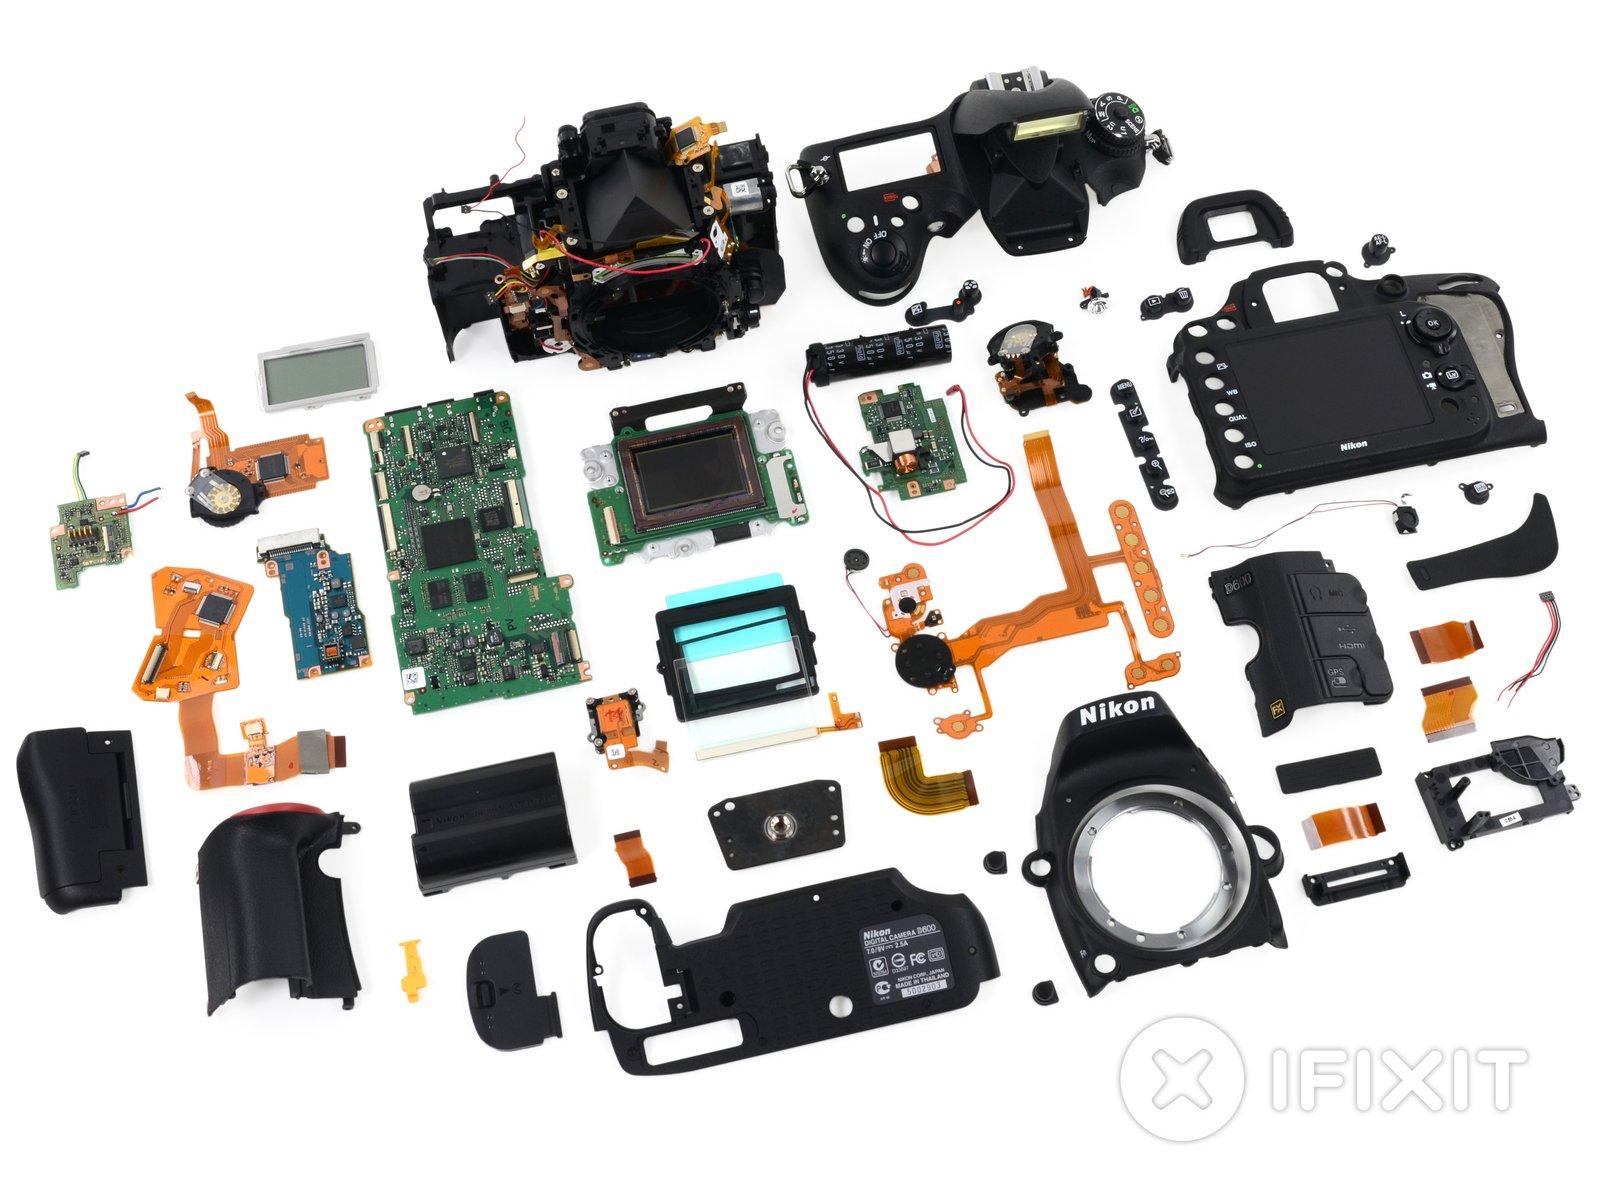 nikon d600 teardown ifixit rh nl ifixit com Nikon D600 vs Canon 6D Nikon D600 and D700